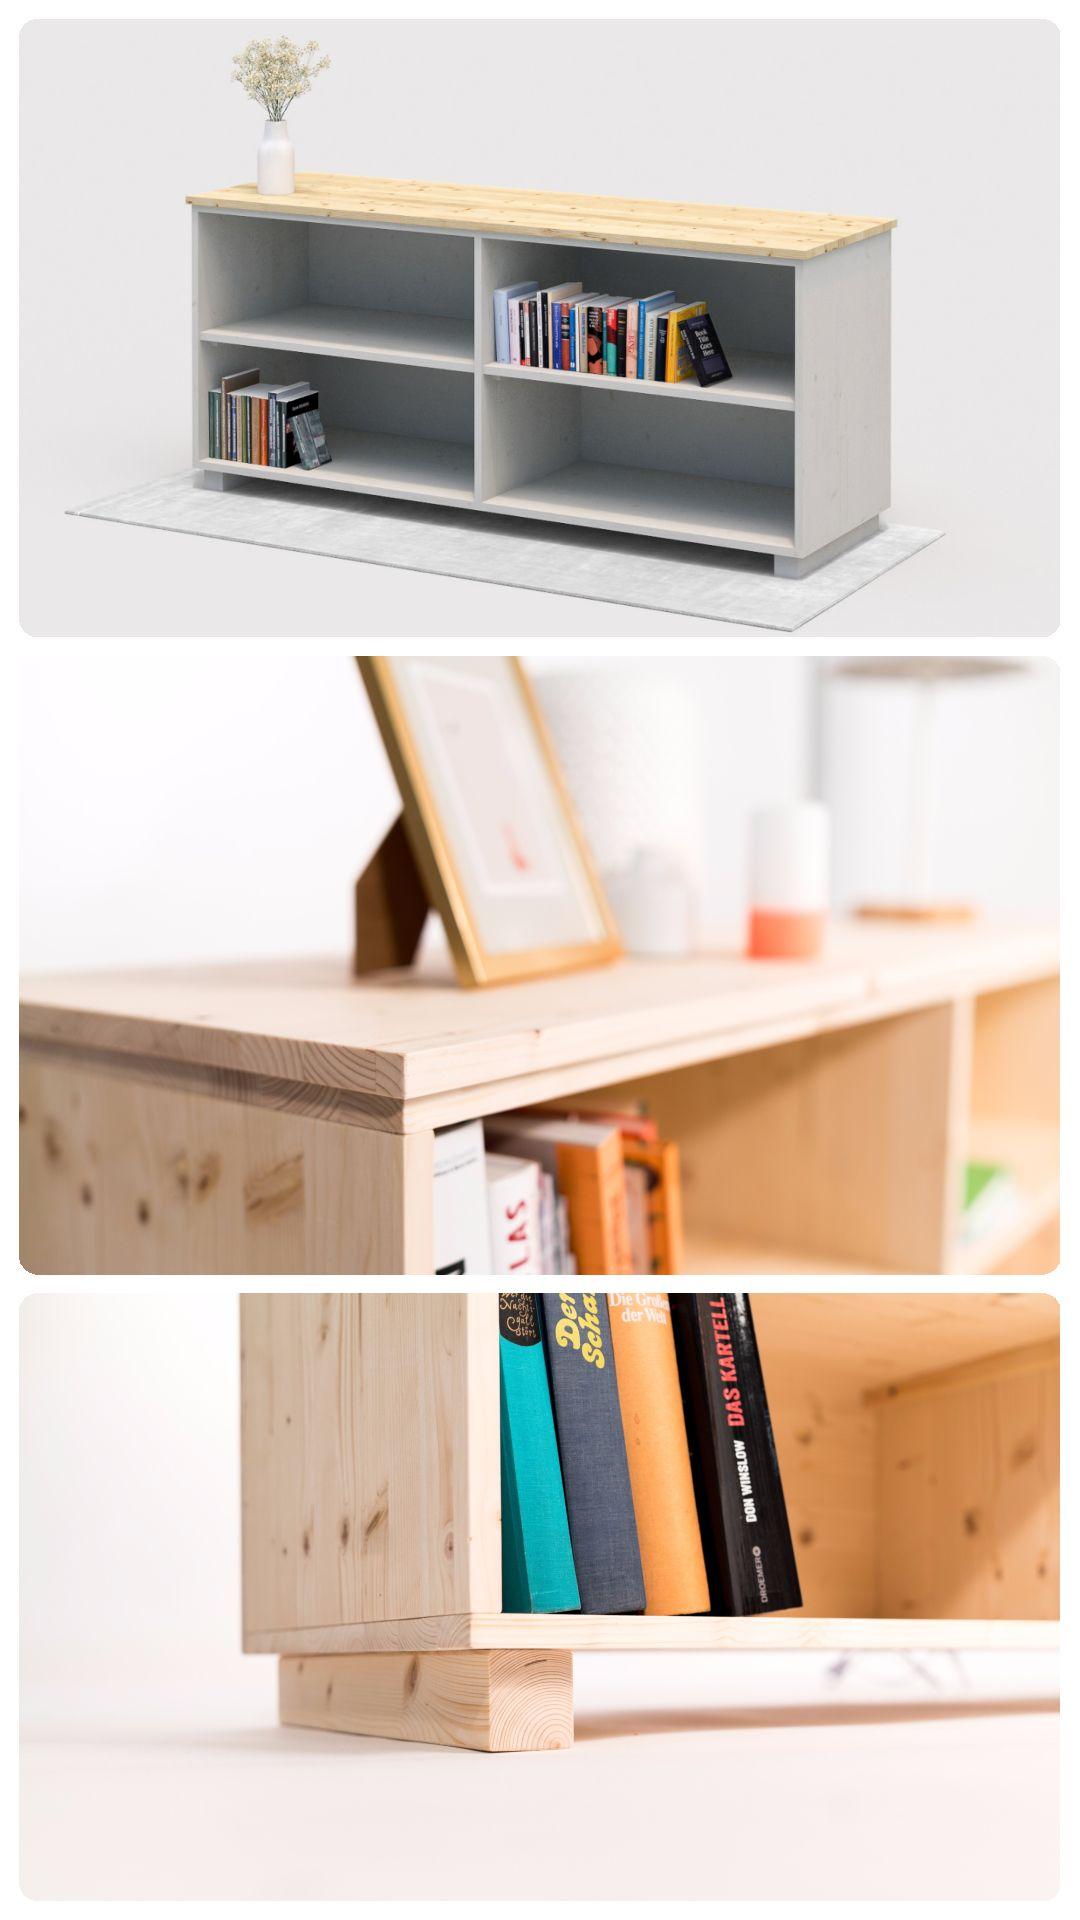 Sideboard Thea Selber Bauen Alle Mobel Create By Obi Schrank Selber Bauen Sideboard Selber Bauen Bett Selber Bauen